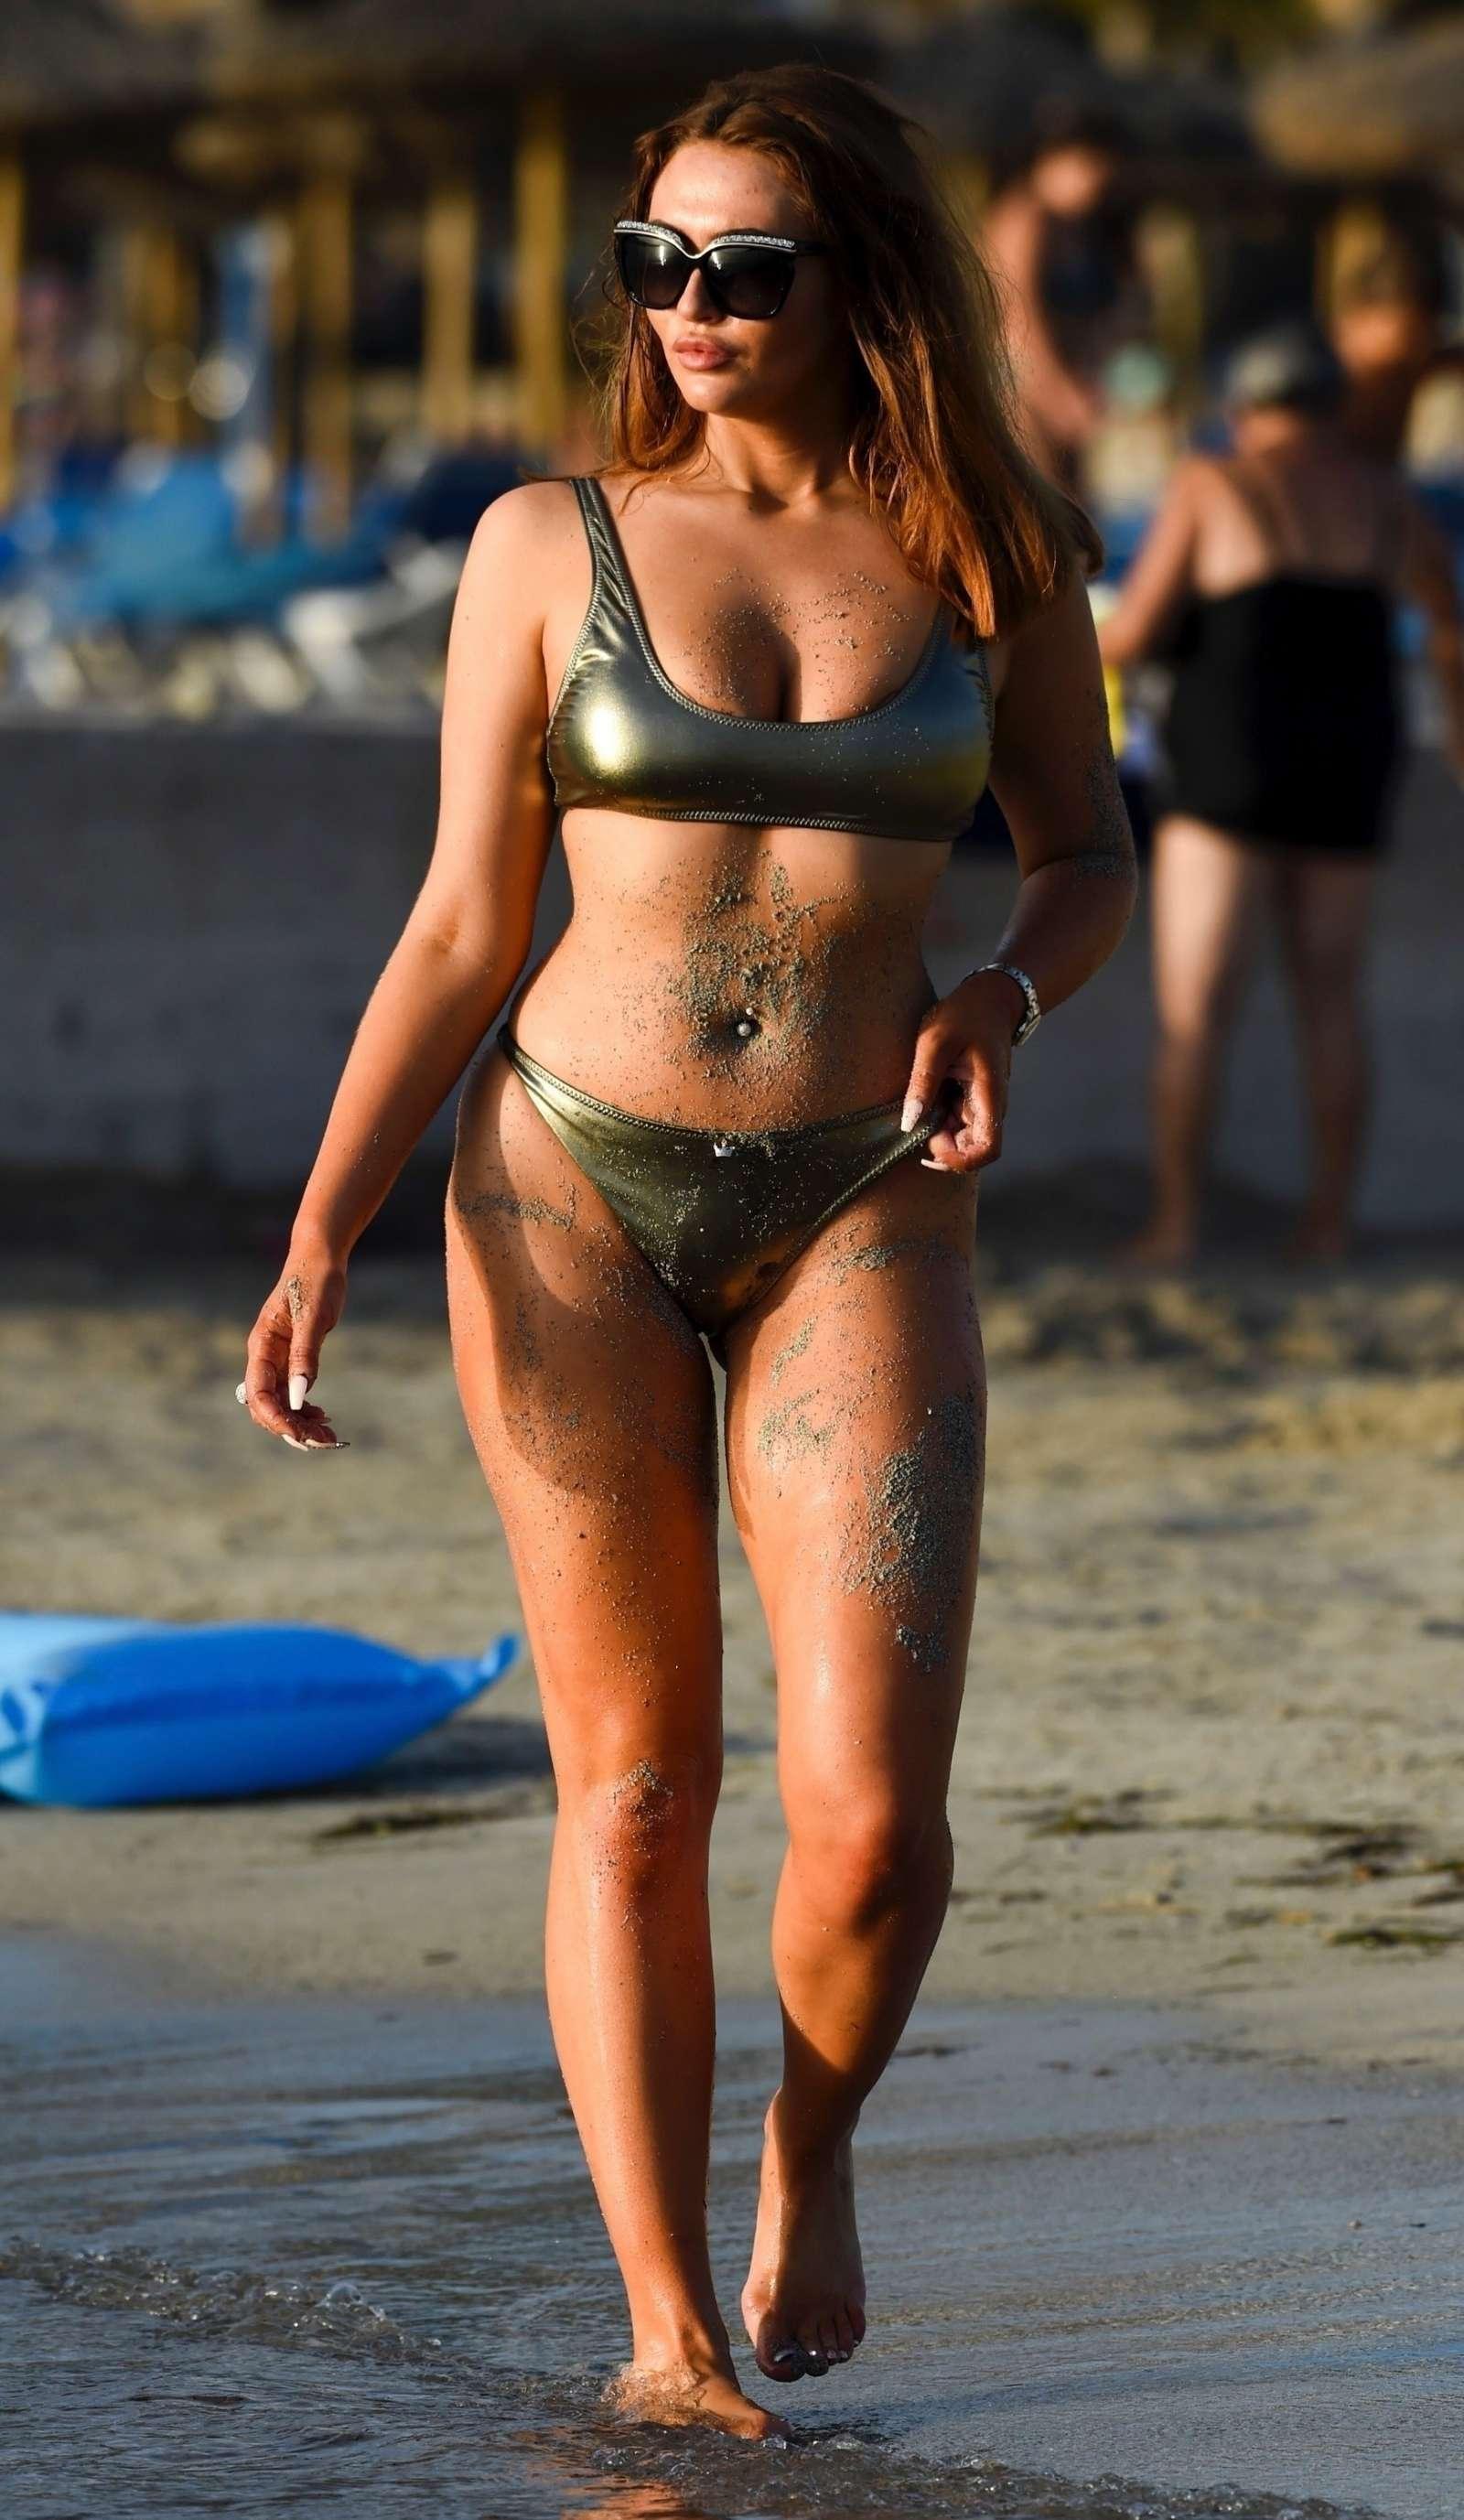 Charlotte Dawson 2017 : Charlotte Dawson in Bikini 2017 -08